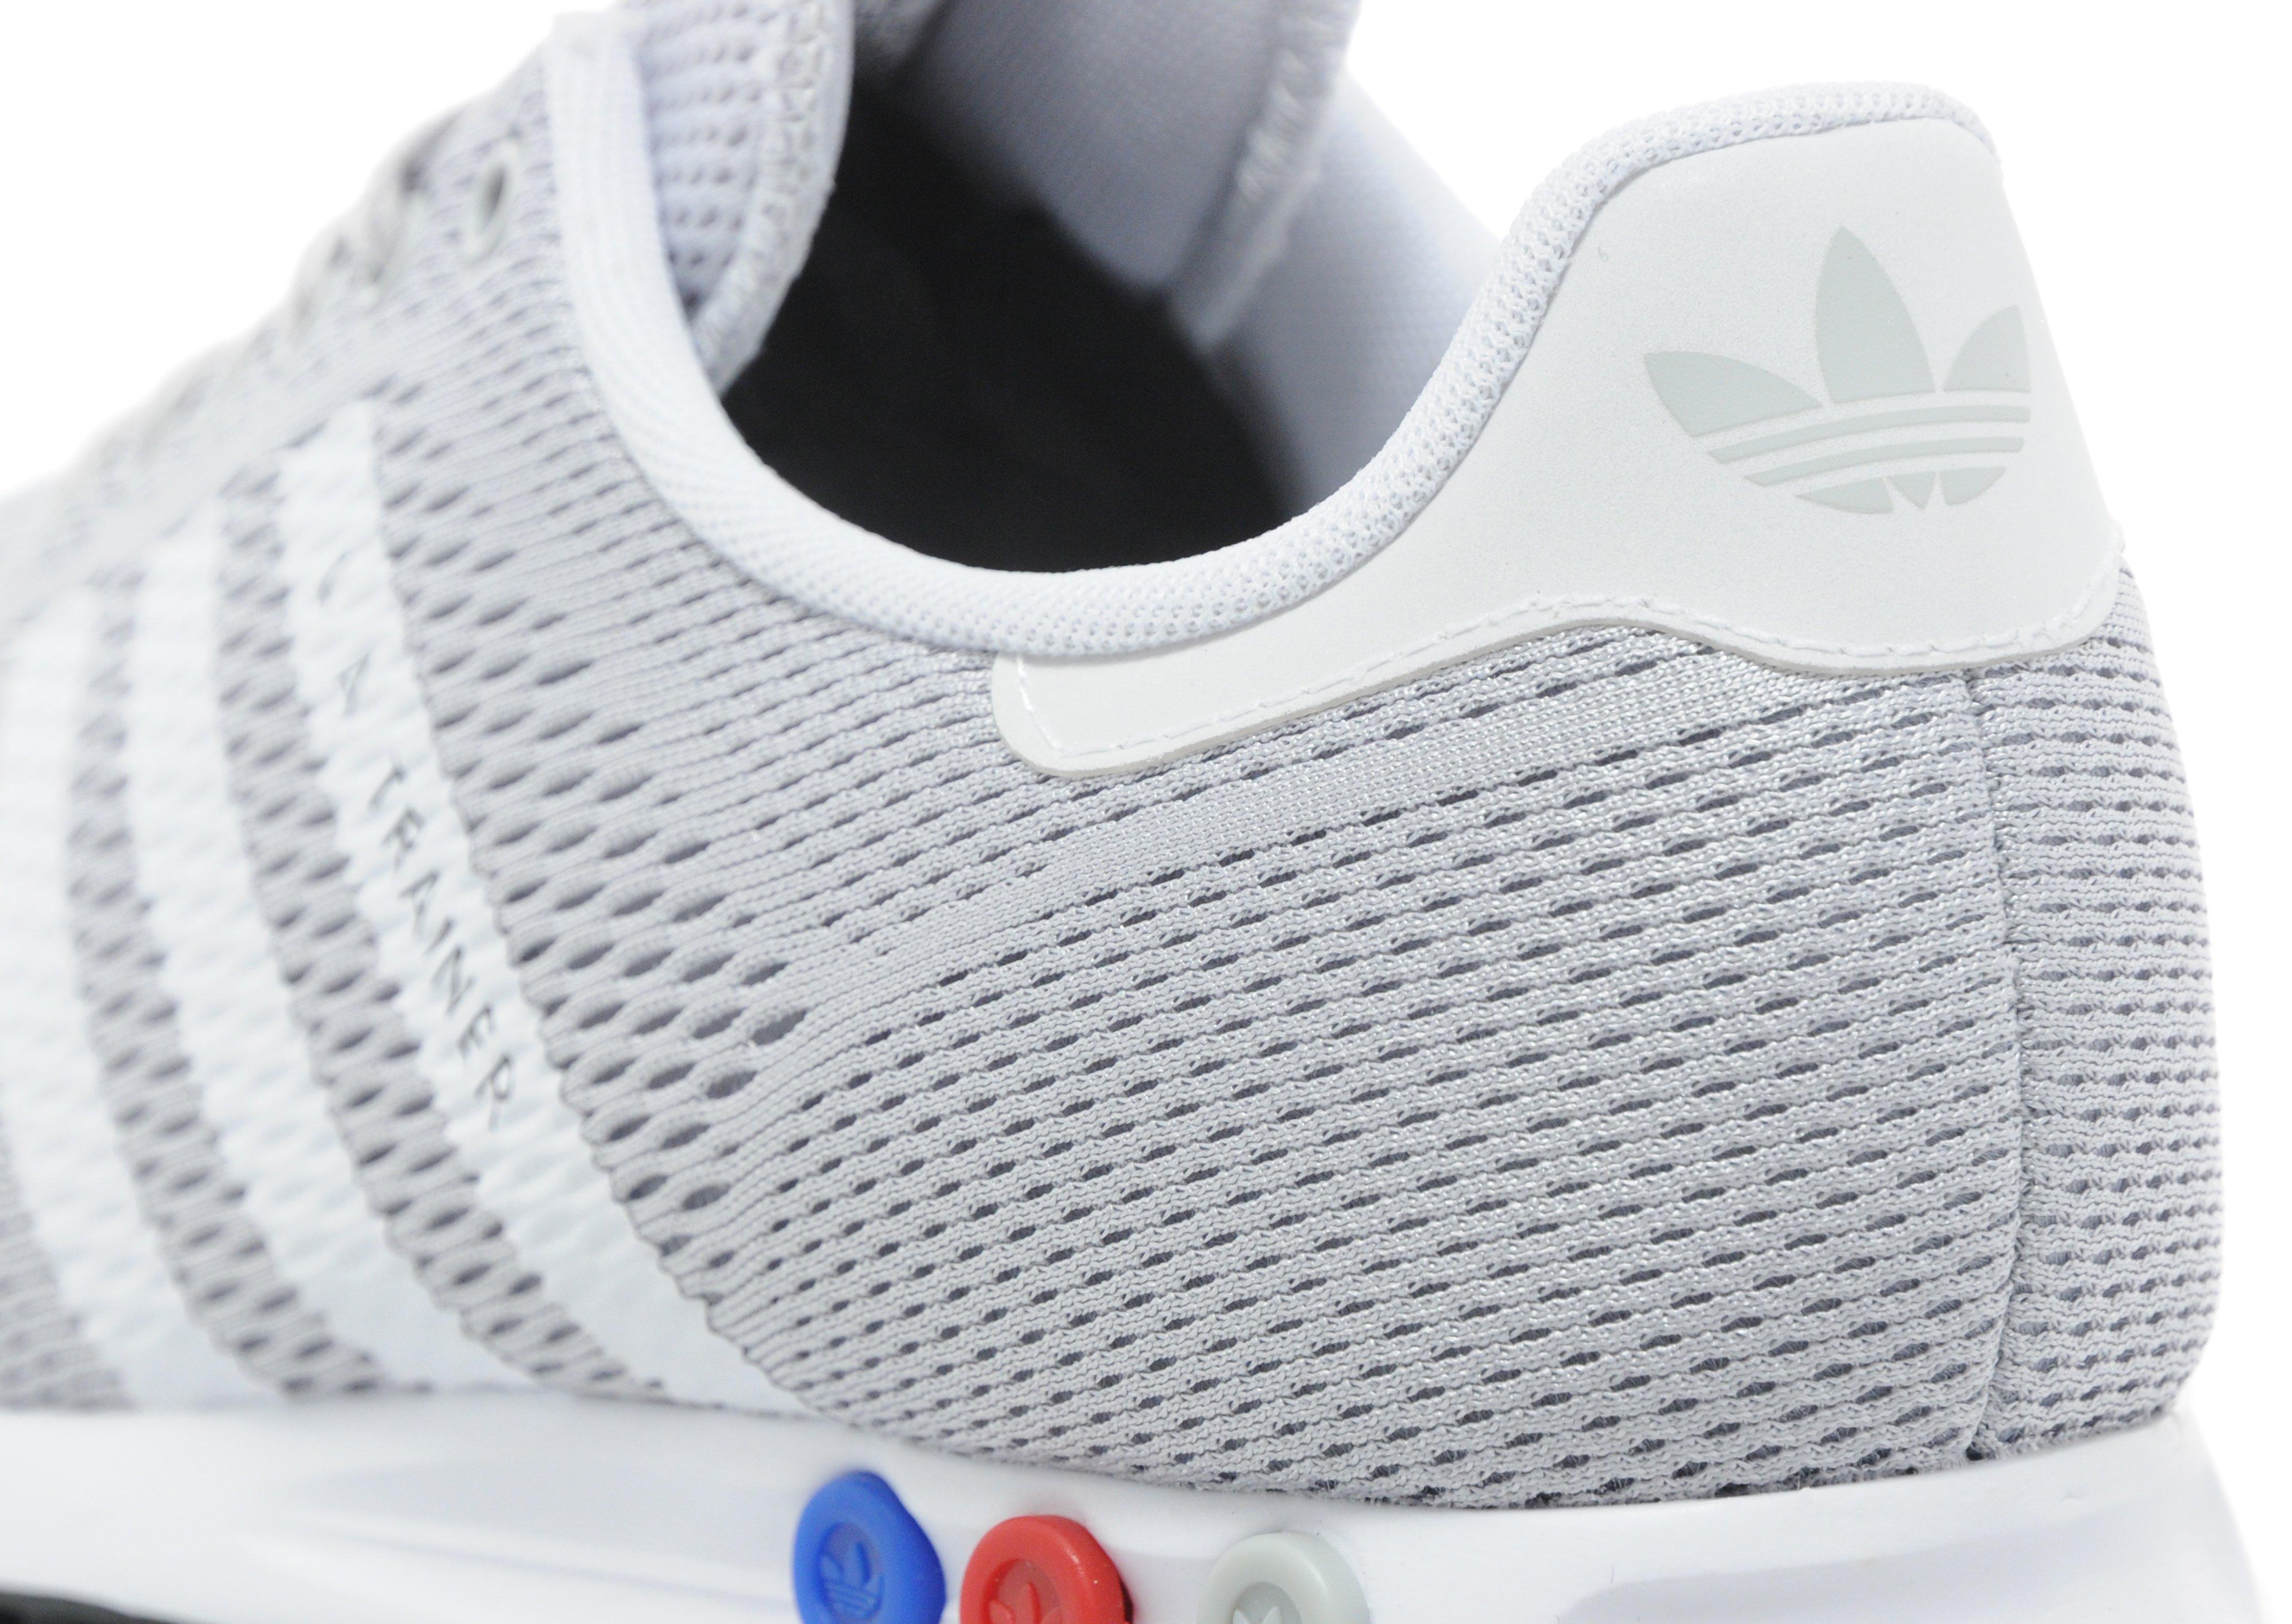 Adidas La Trainer Mesh chriscorneyproductions.co.uk